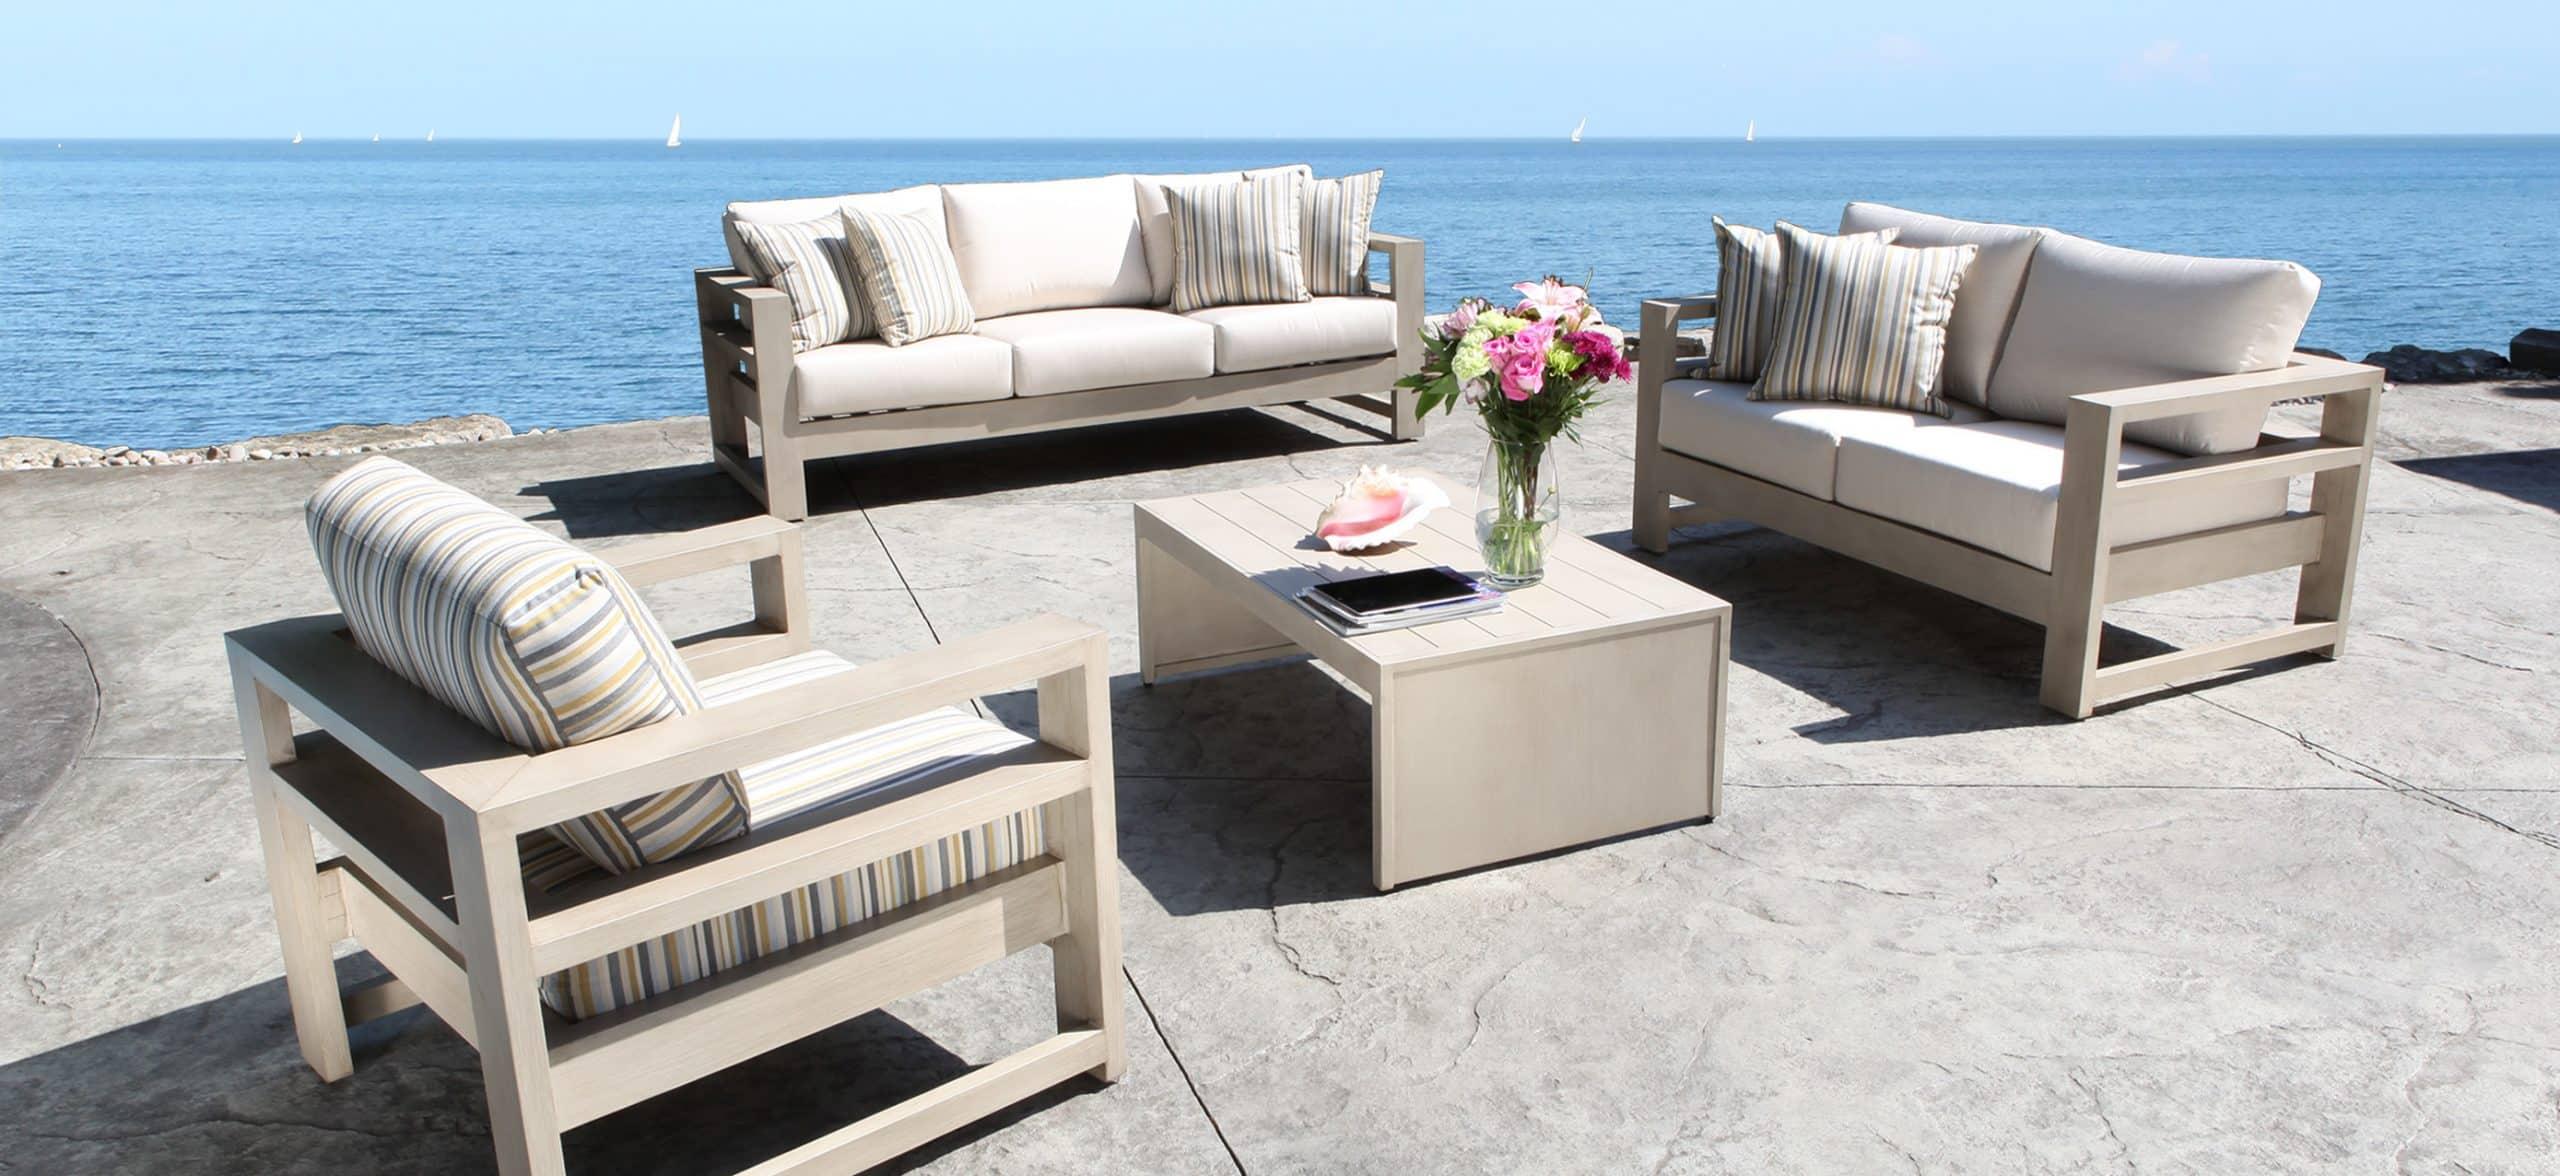 23 Modern Outdoor Furniture Ideas -DesignBump